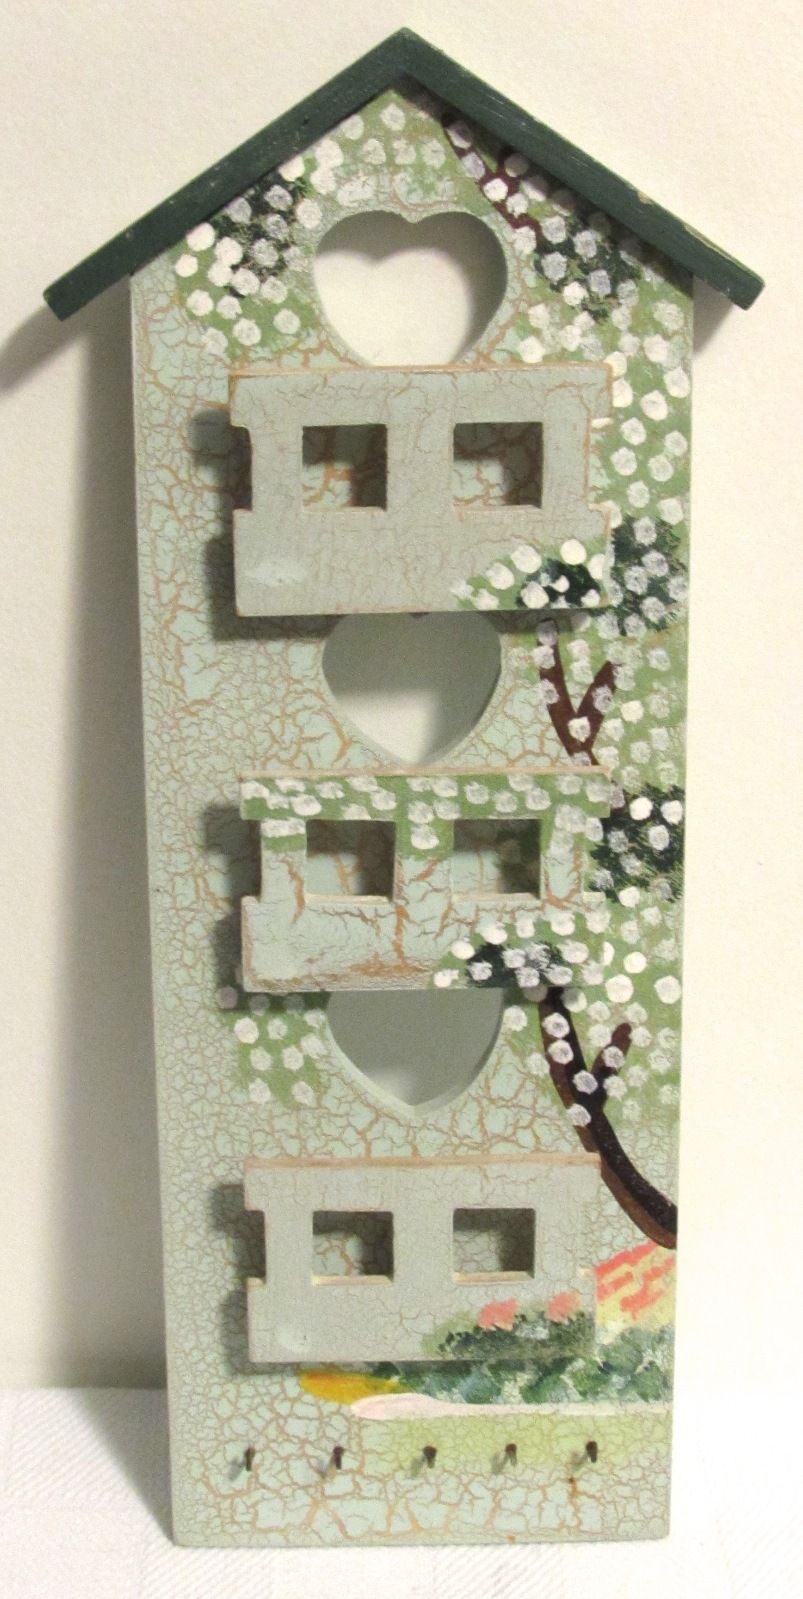 Wooden 3 Slot Letter Sorter & Key Organizer Multi-Color Birdhouse Design